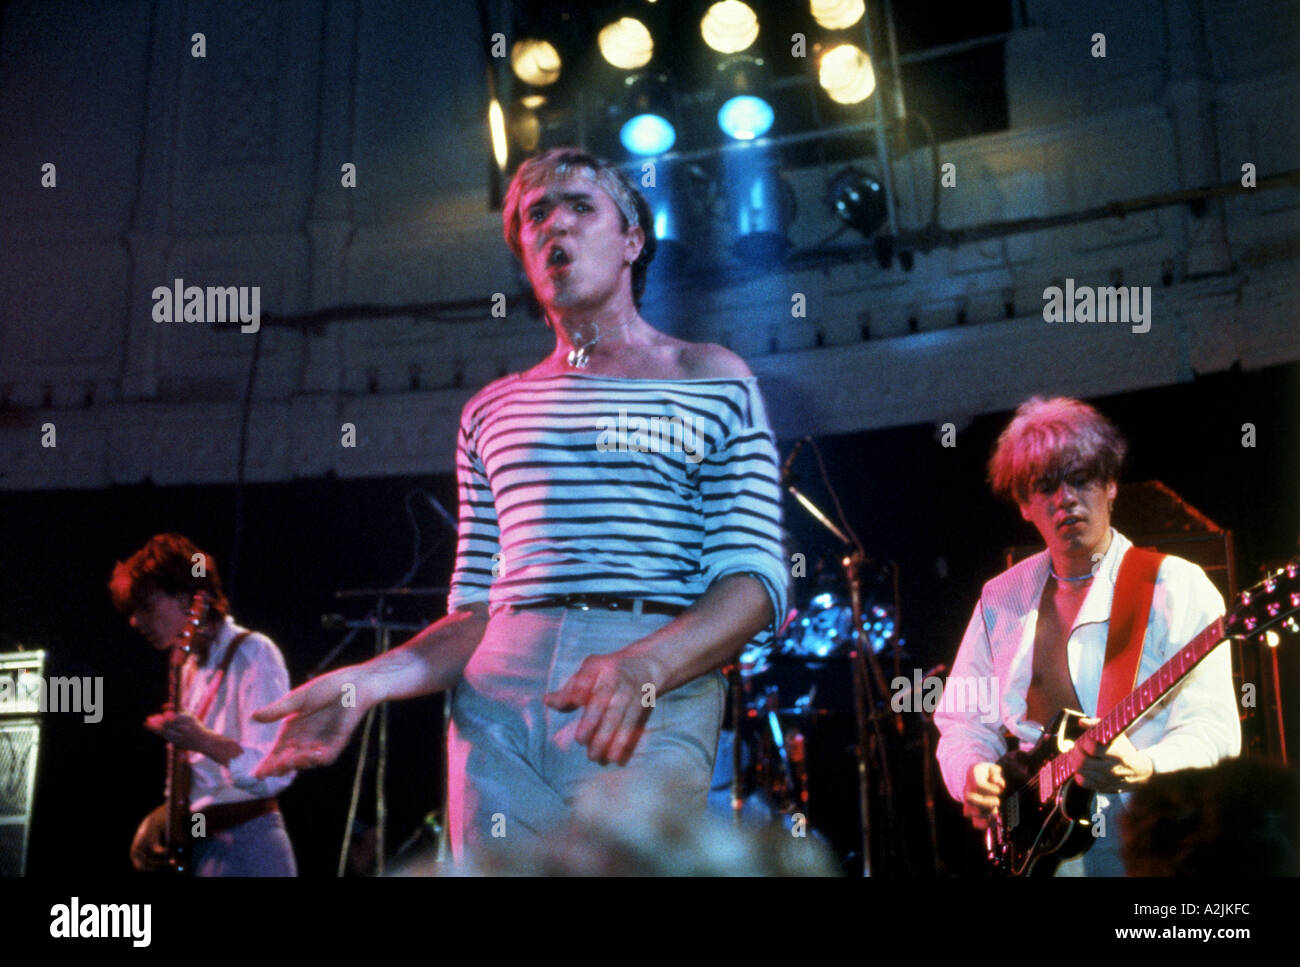 DURAN DURAN UK-pop-Band mit Simon Le Bon als lead-Sänger der 80er Jahre Stockbild